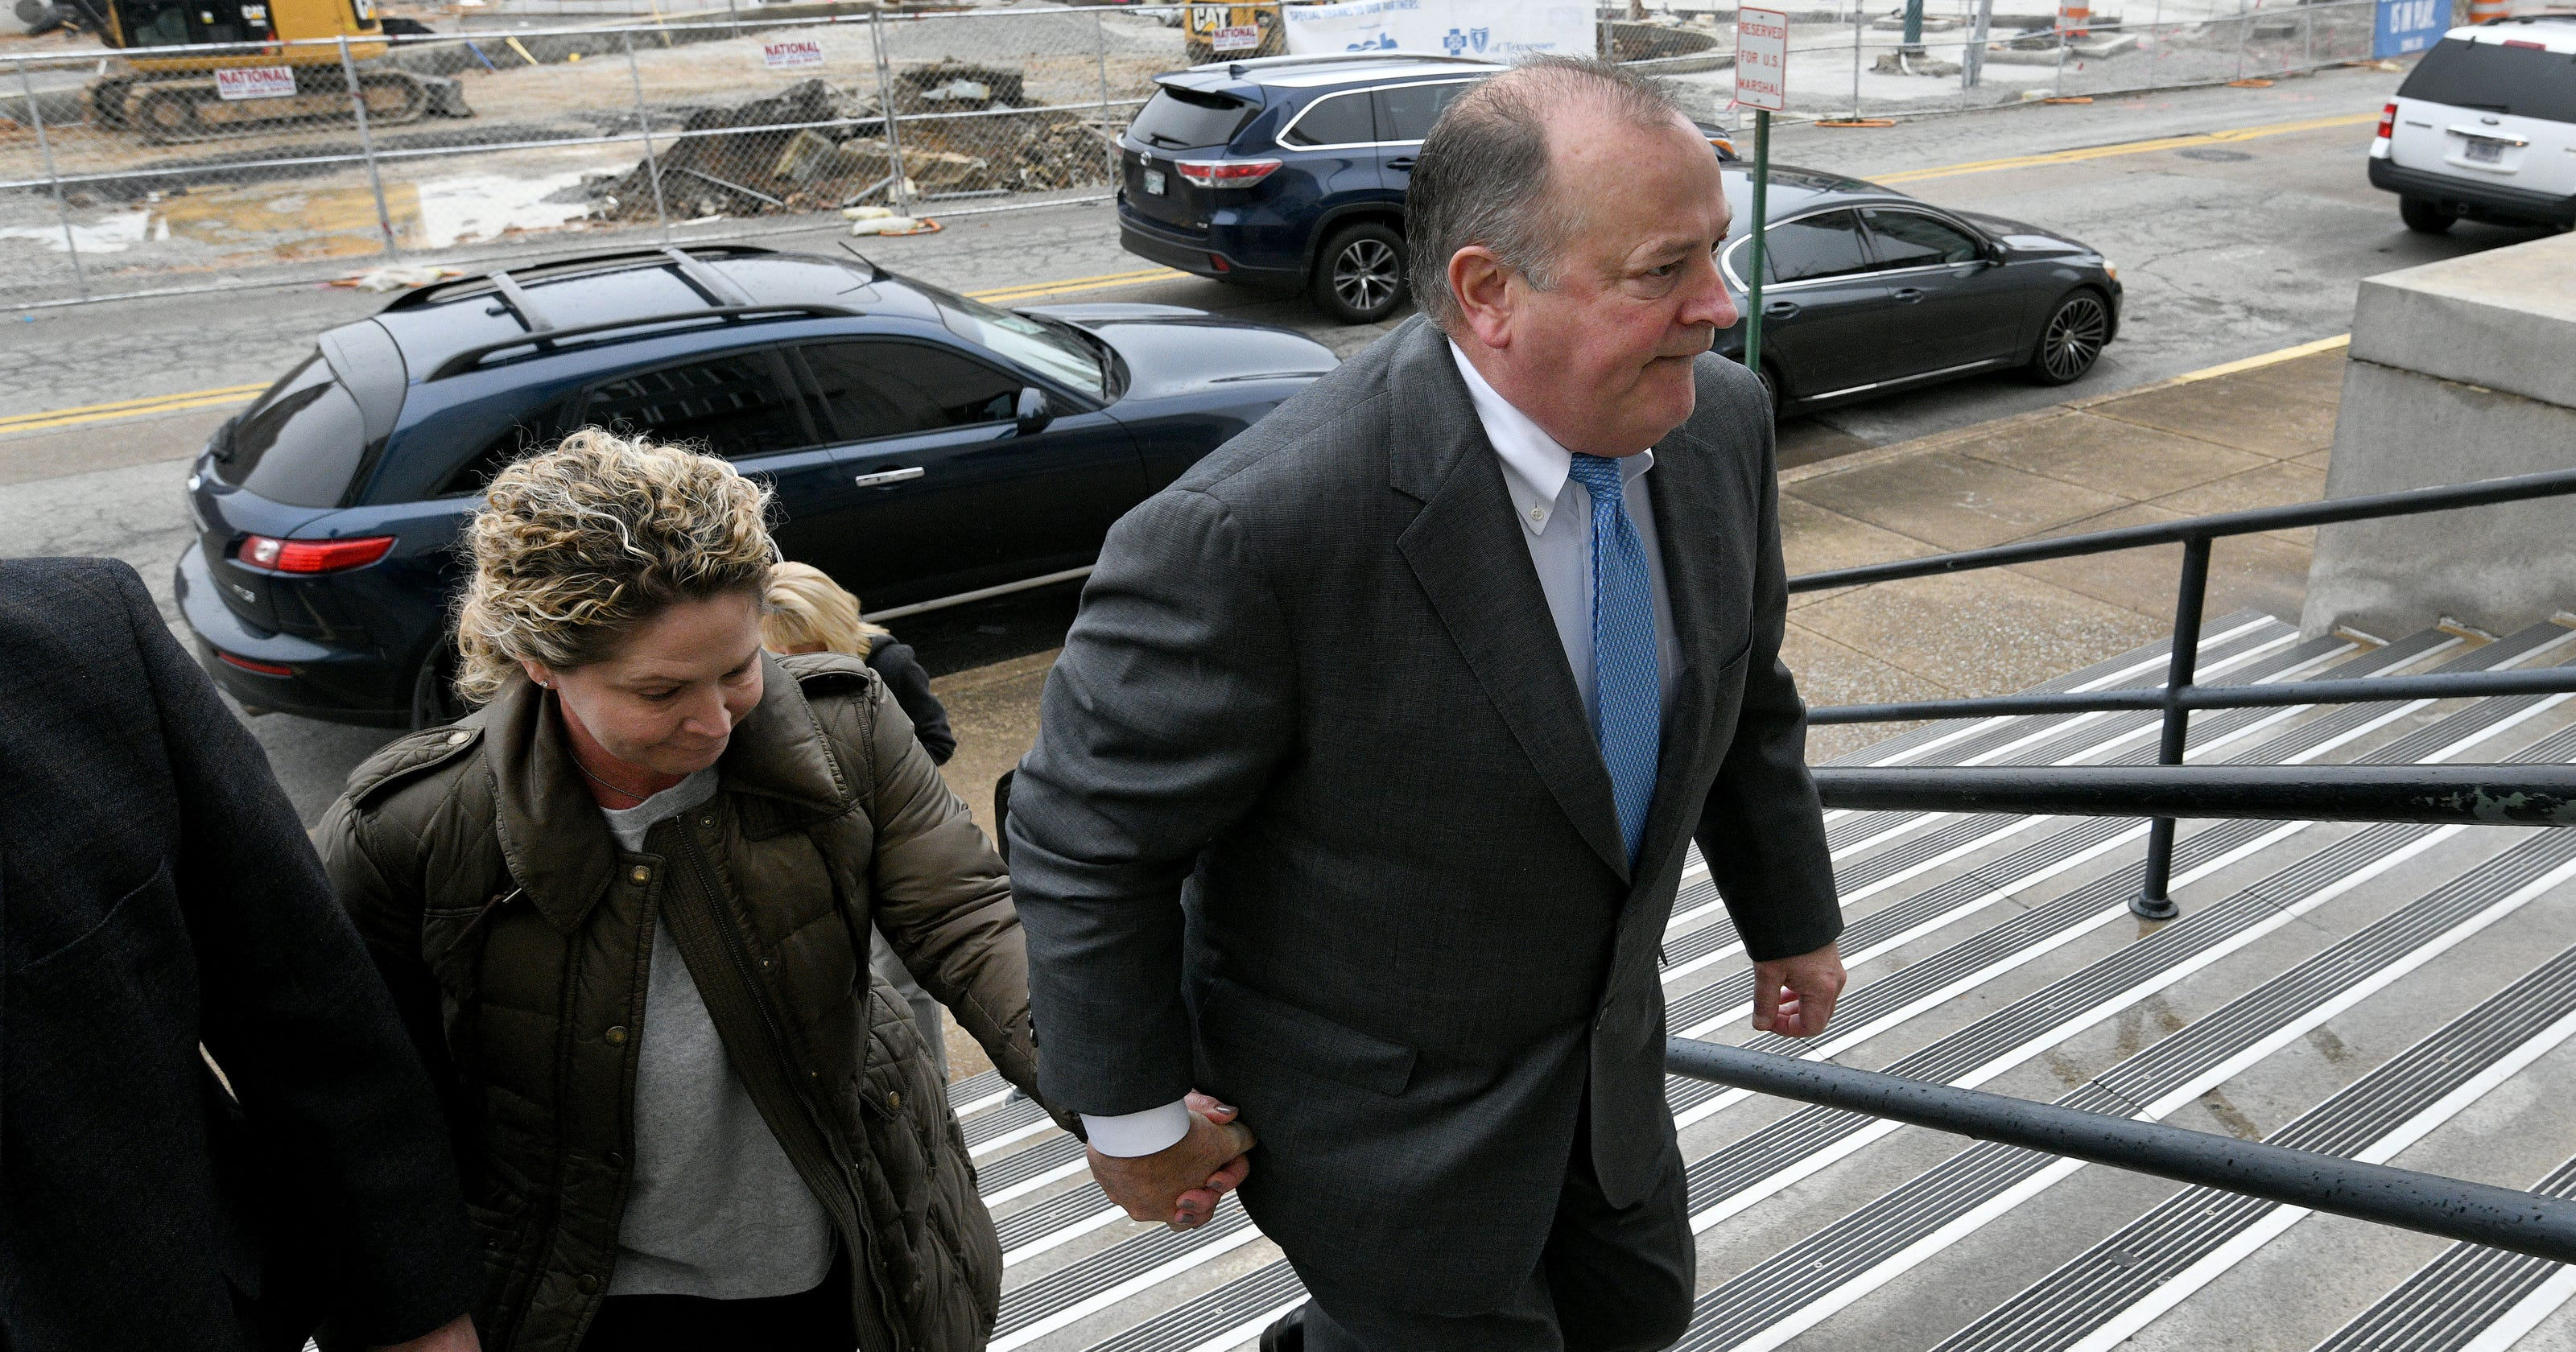 Former Pilot Flying J President Put Under House Arrest Wire Scheme